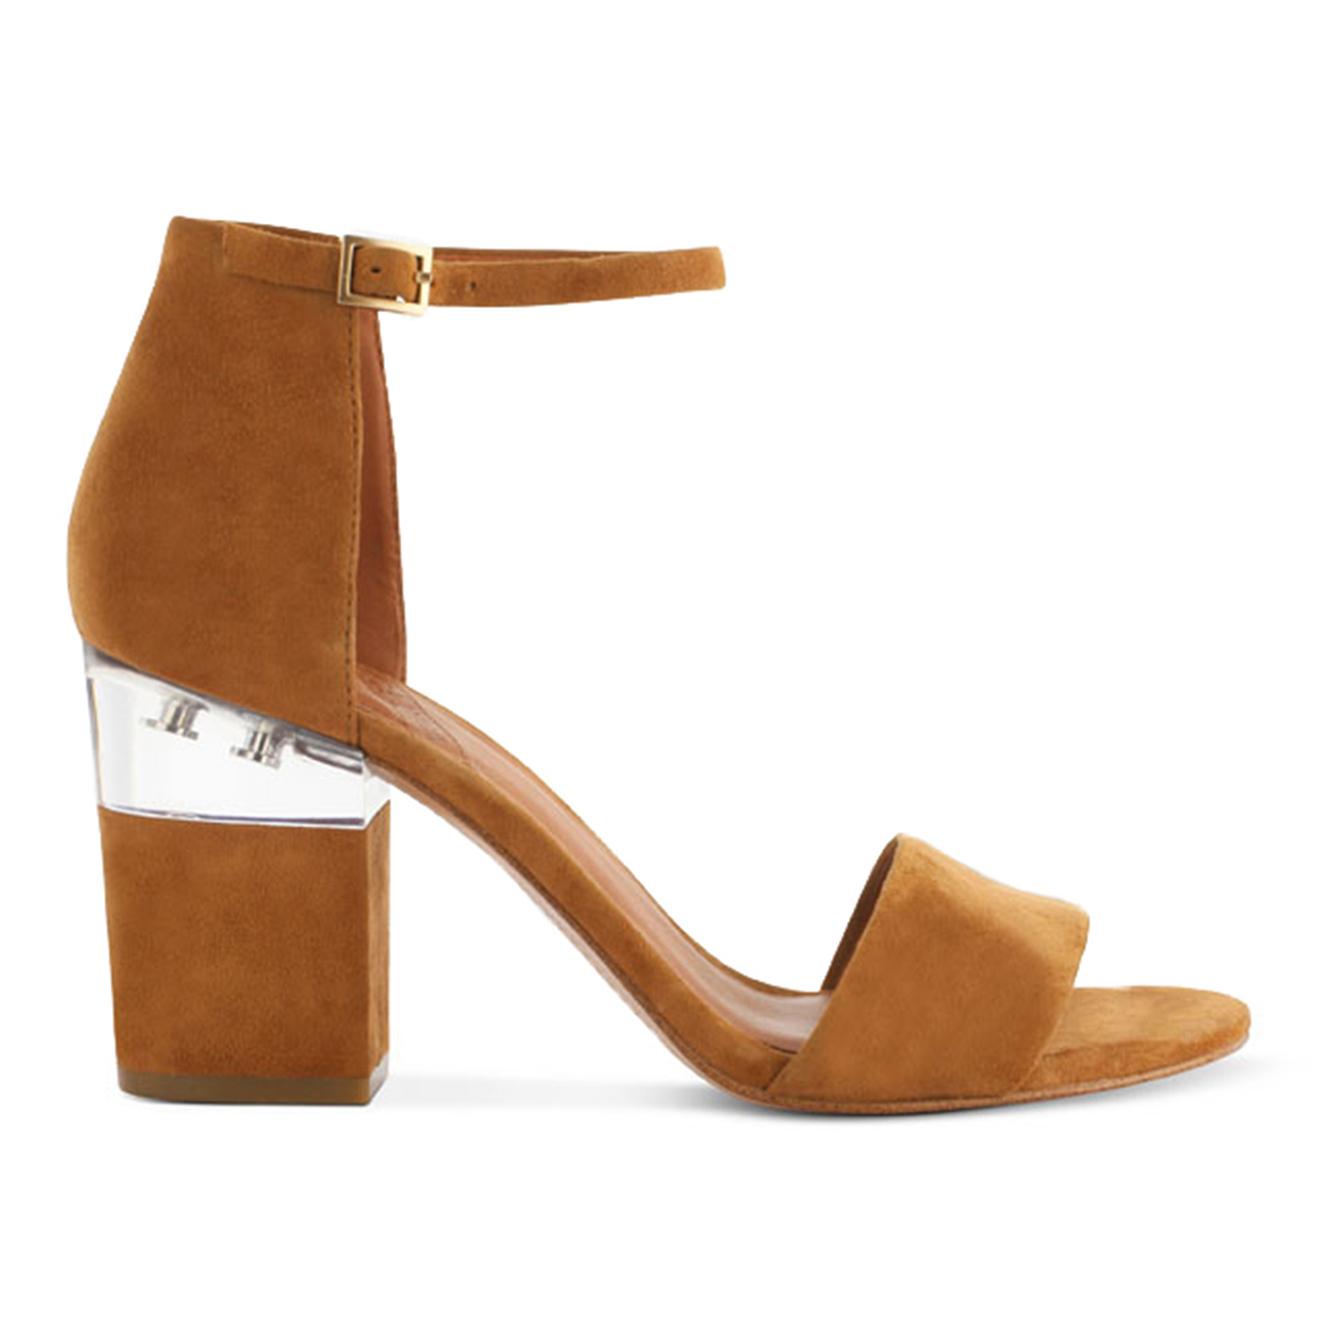 Sandales en Velours de Cuir Scarlett camel - Talon 8.5 cm - What For - Modalova